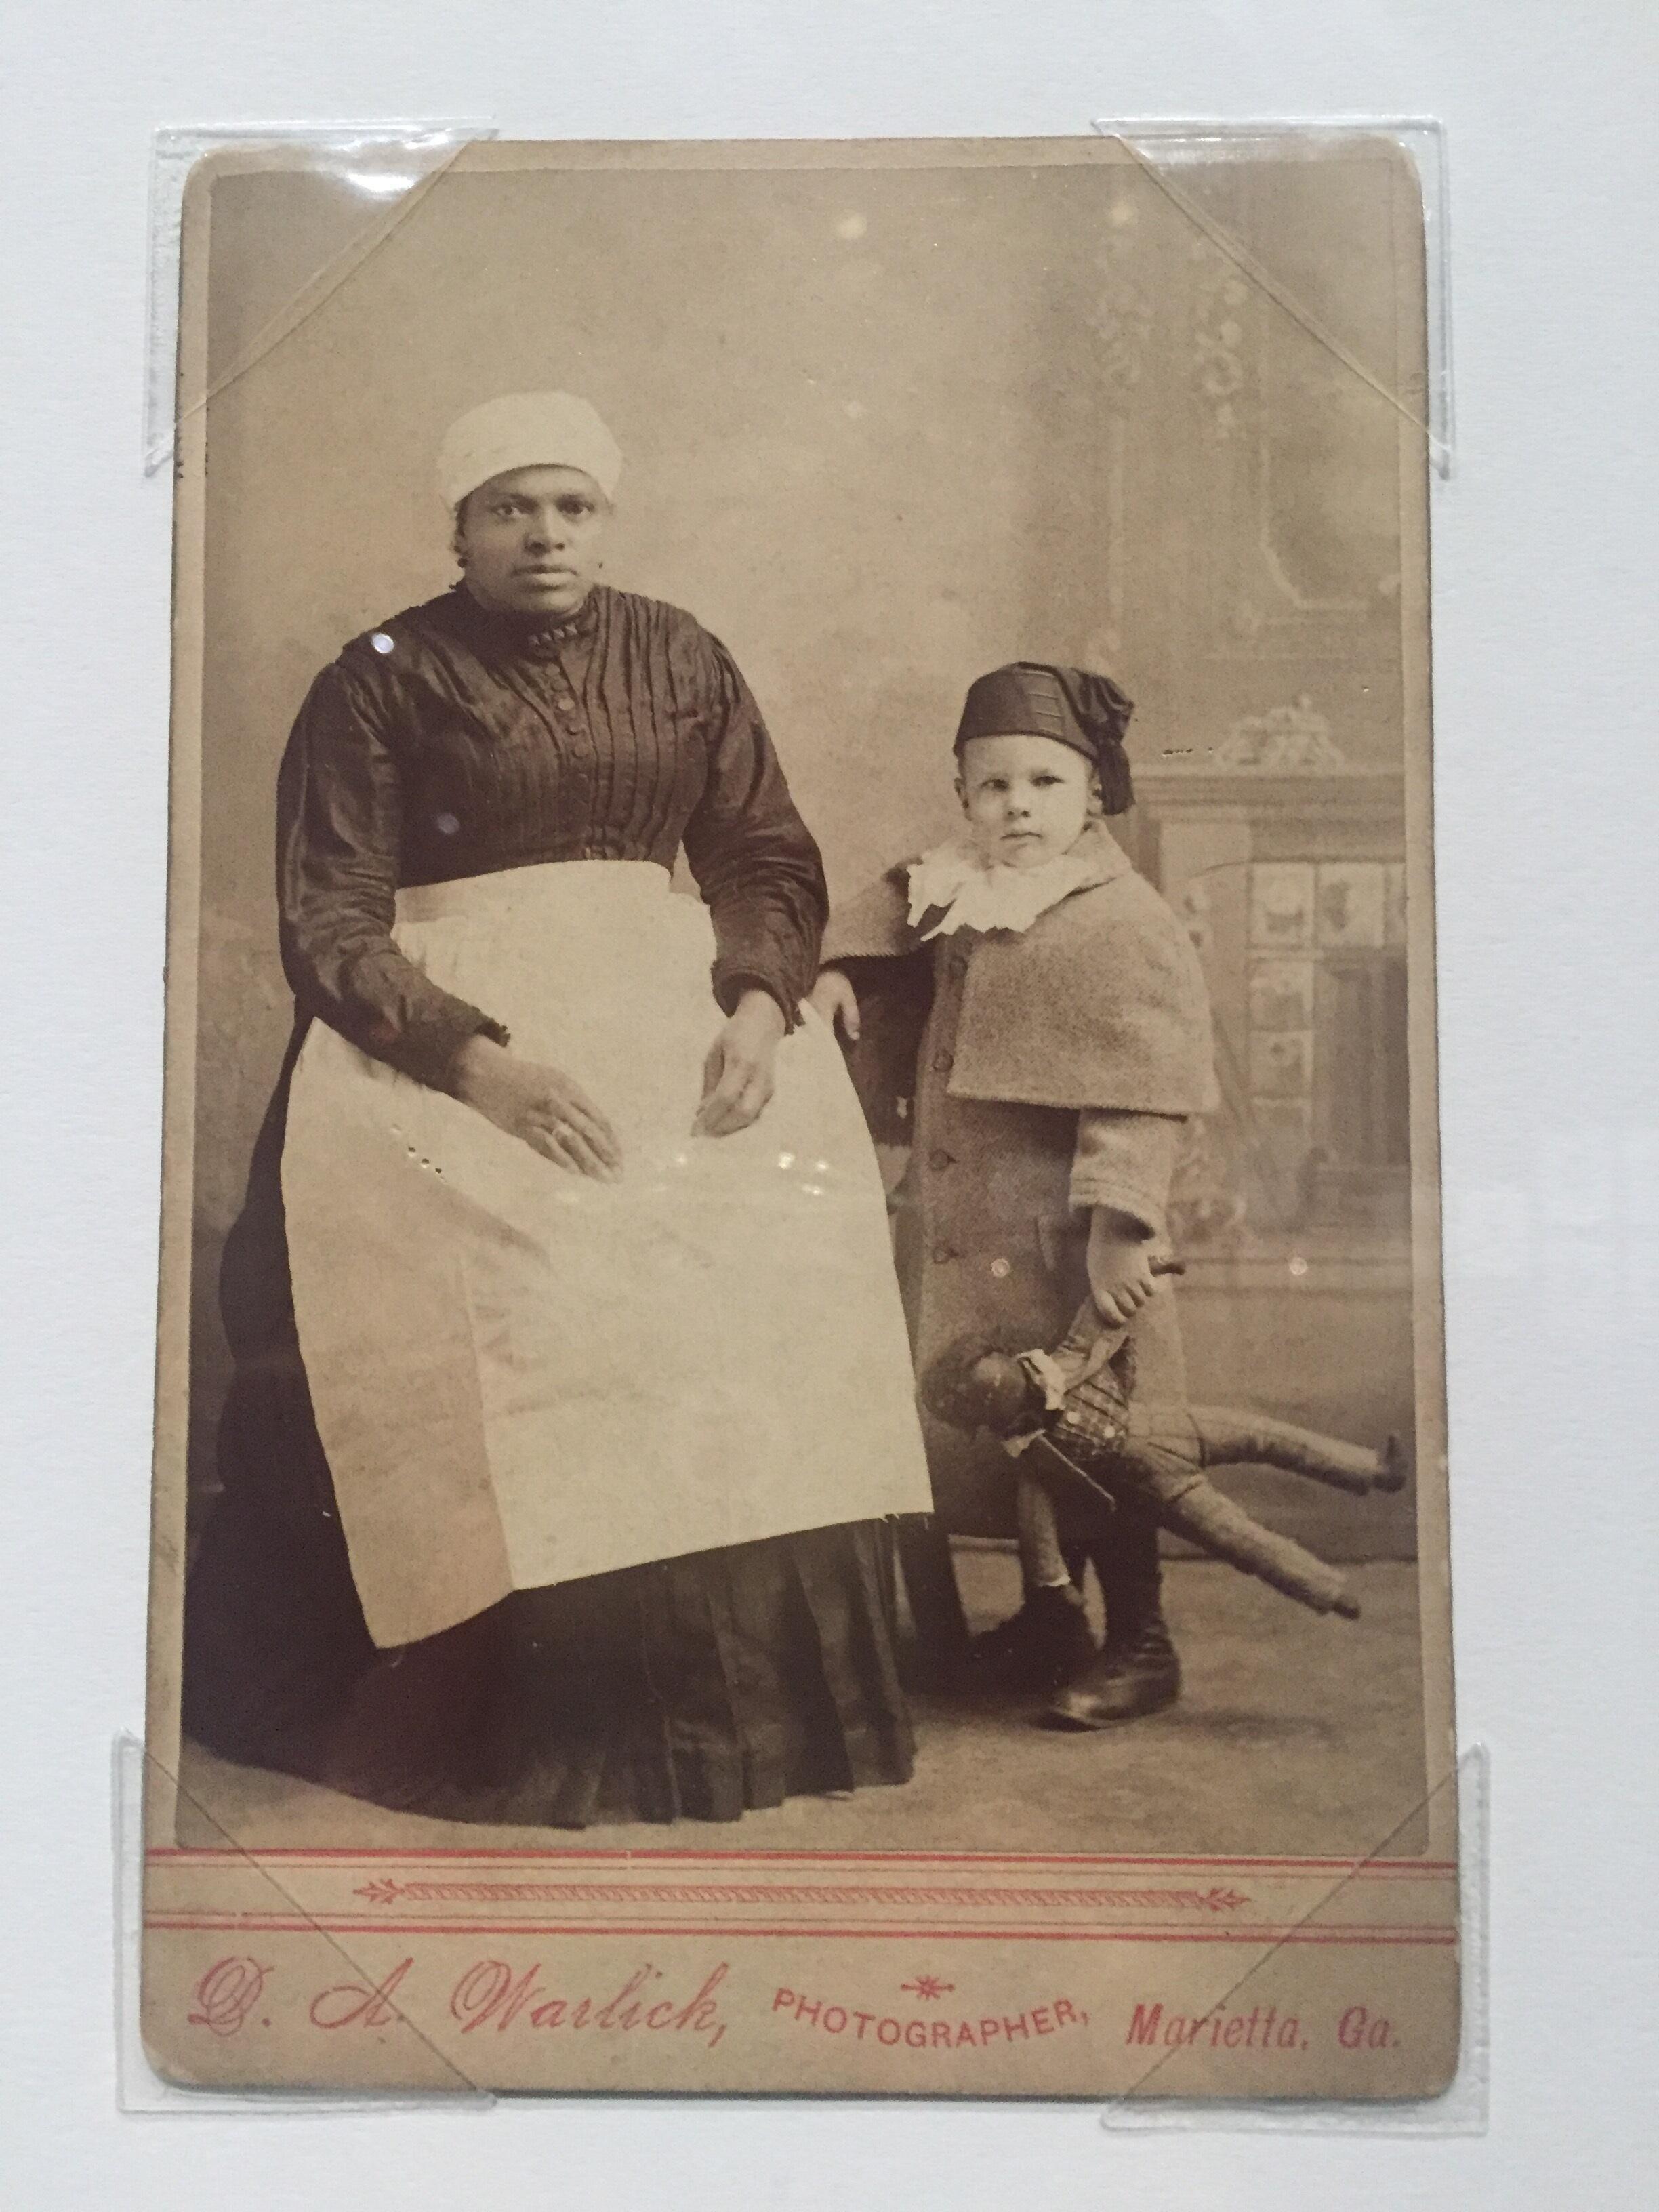 Foto de David A. Warlick, sem título, Marietta, Geórgia, 1891.